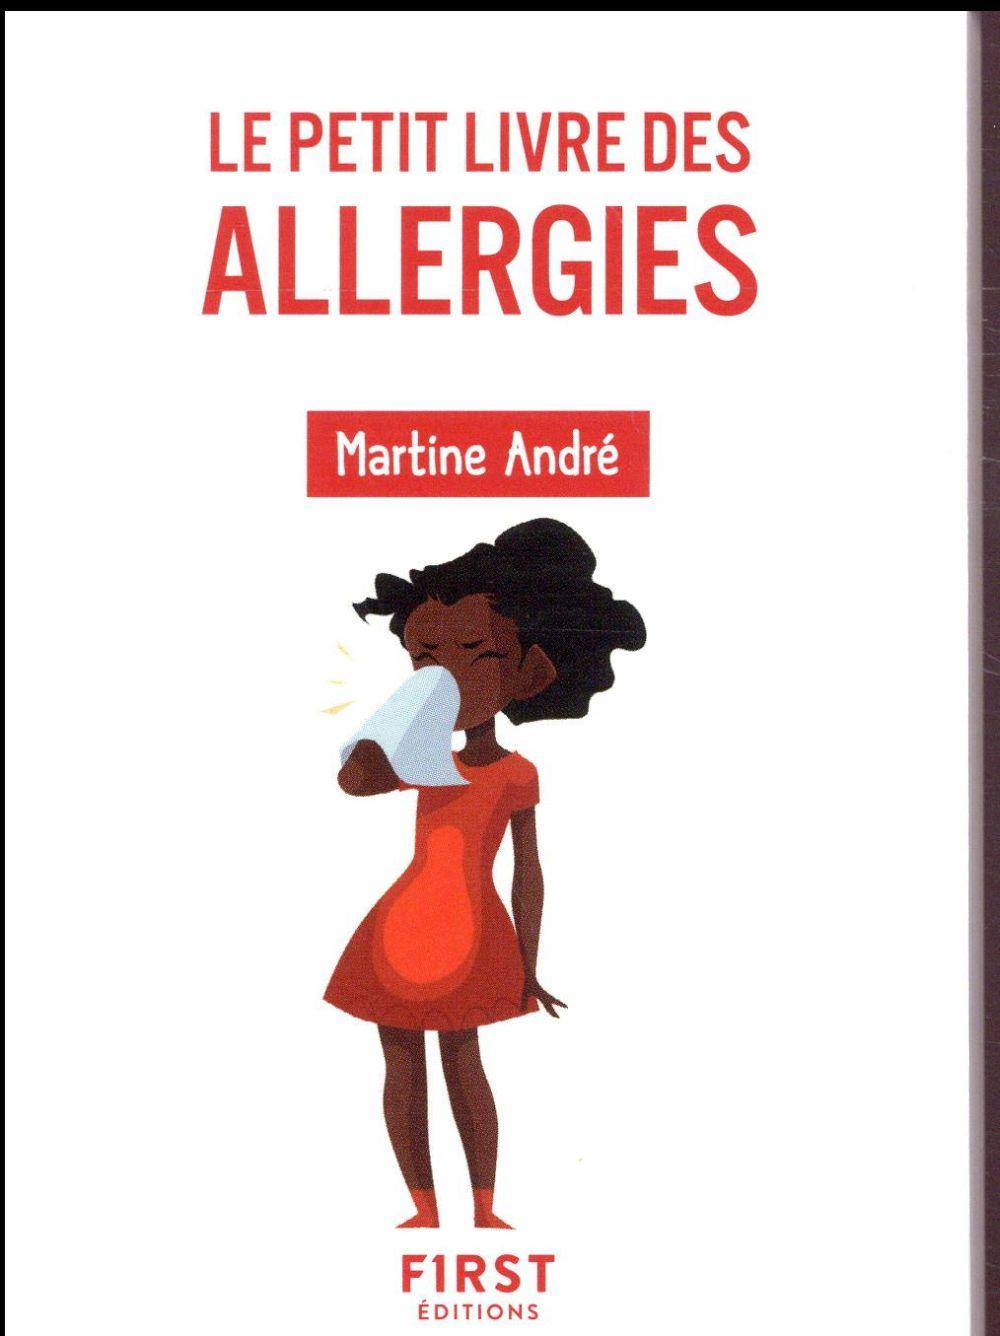 LE PETIT LIVRE DES ALLERGIES - 2E EDITION ANDRE MARTINE FIRST